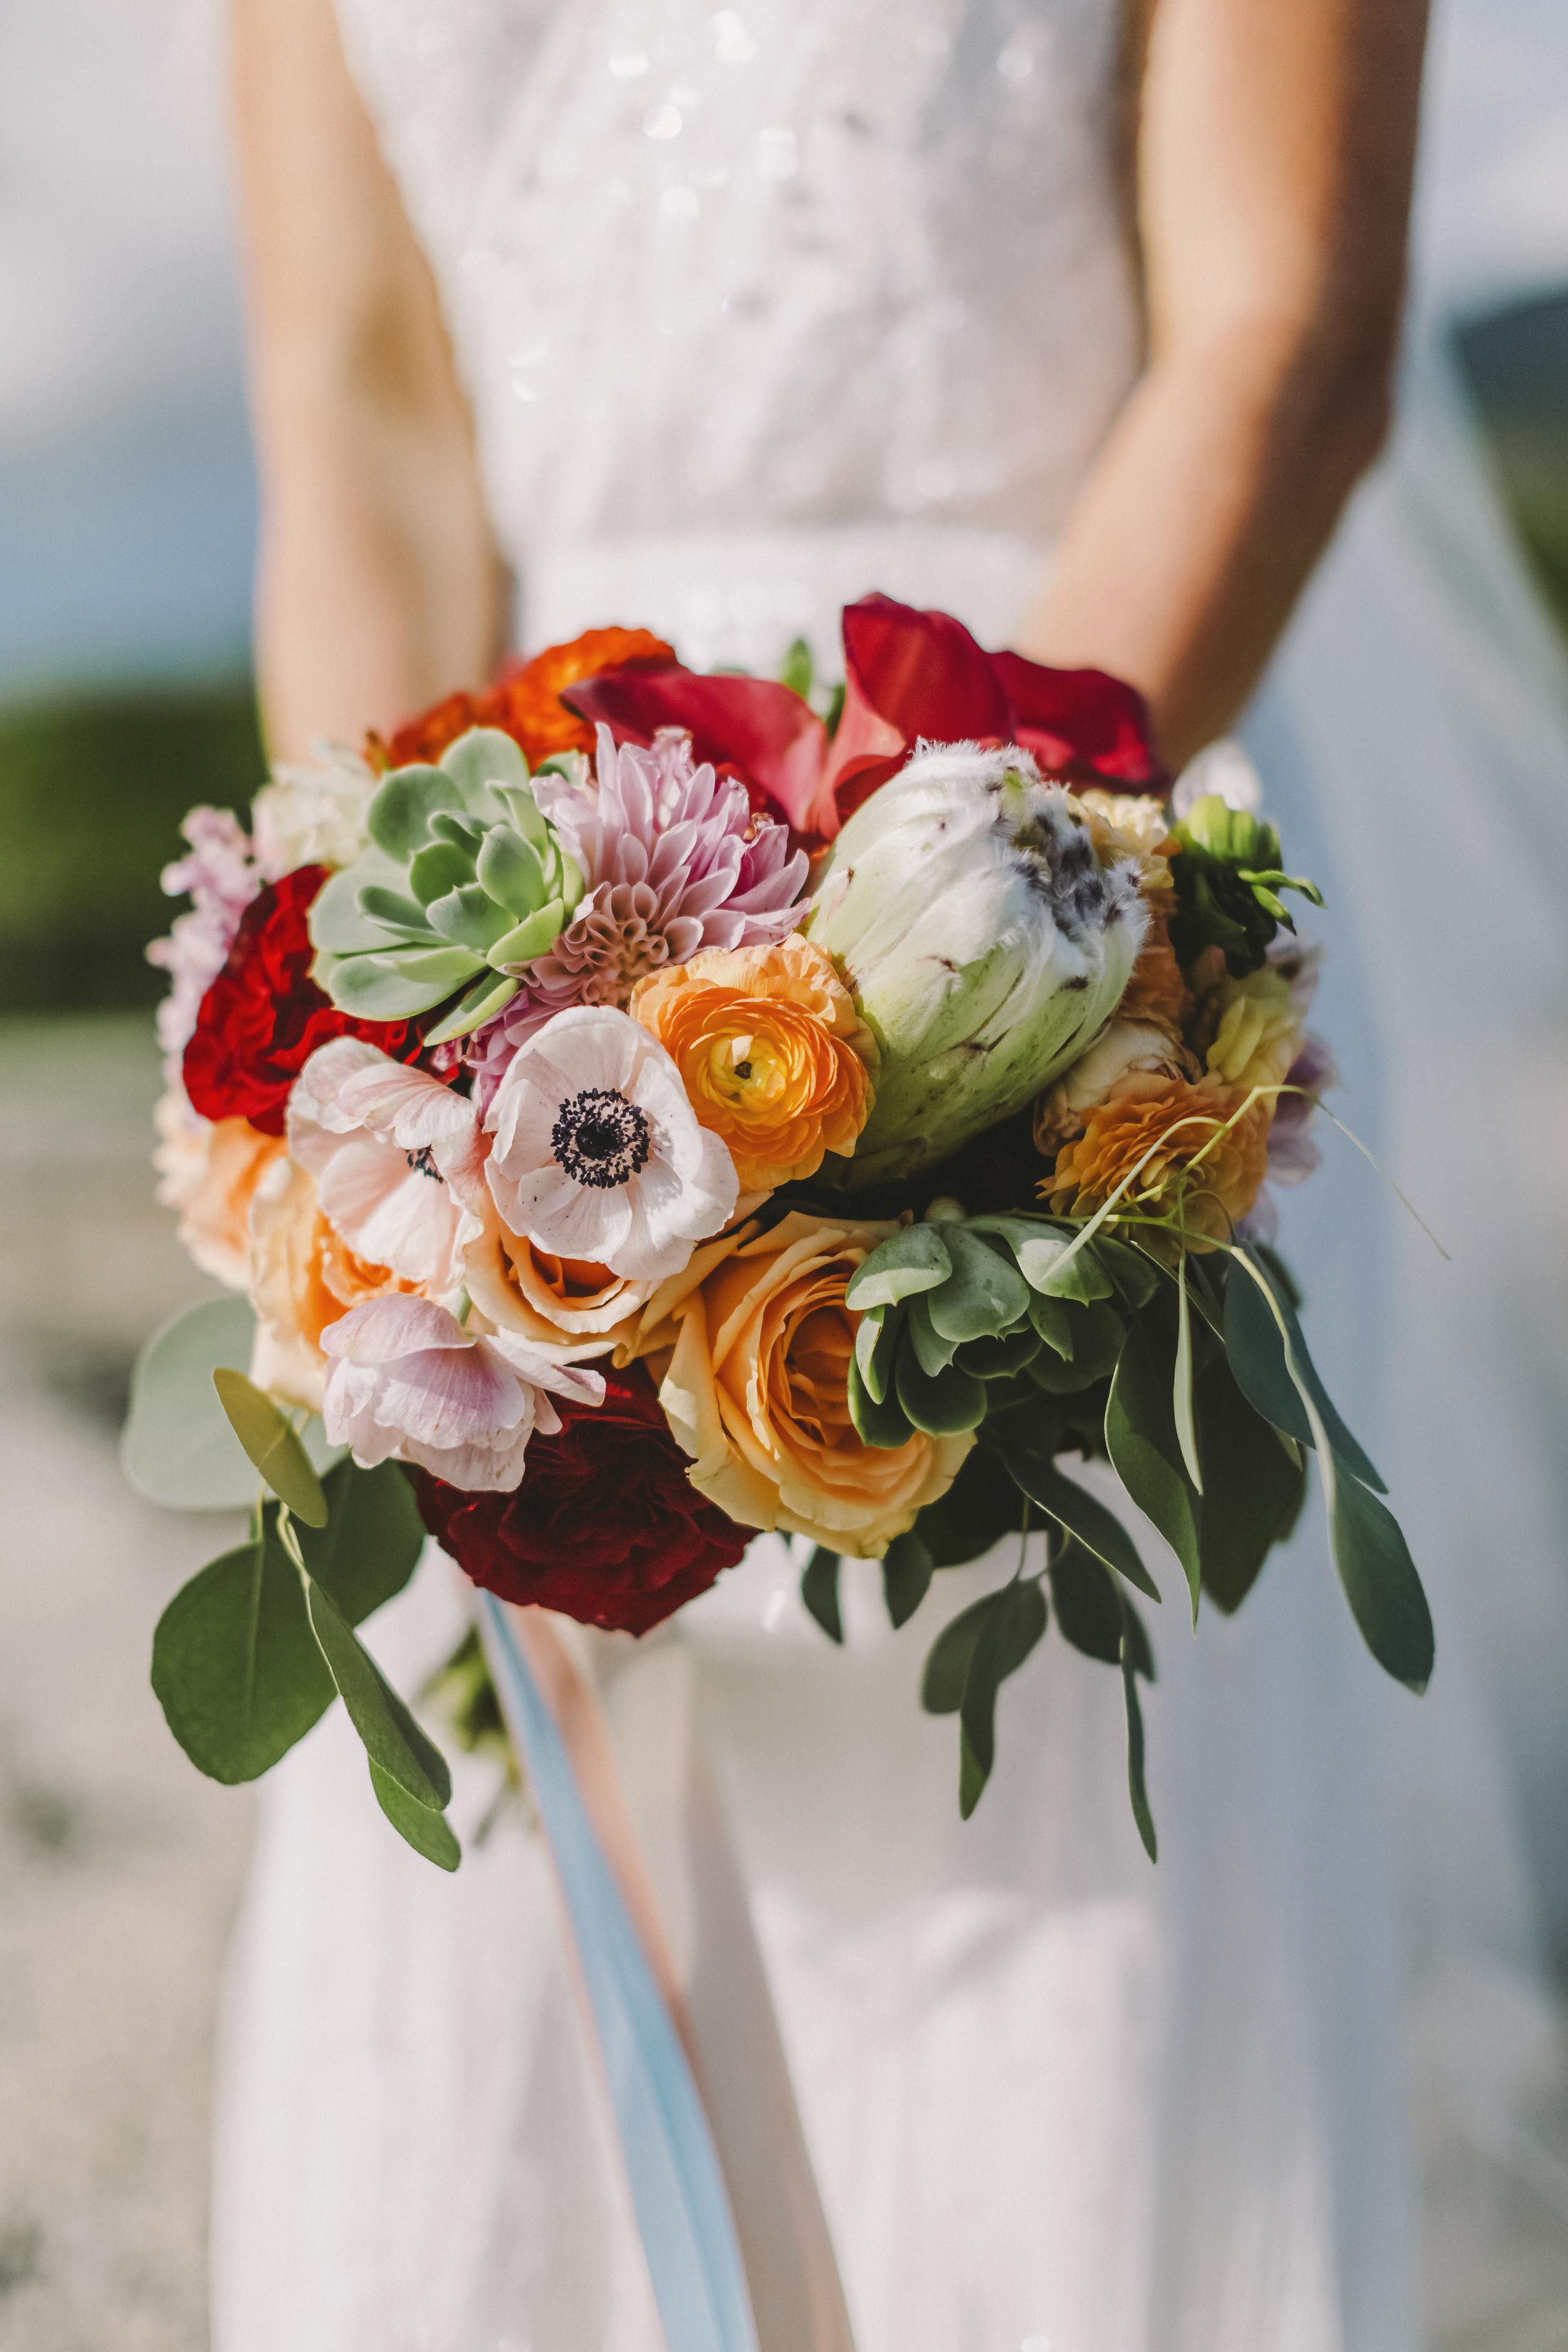 angie-diaz-photography-maui-wedding-mel-matt-71.jpeg